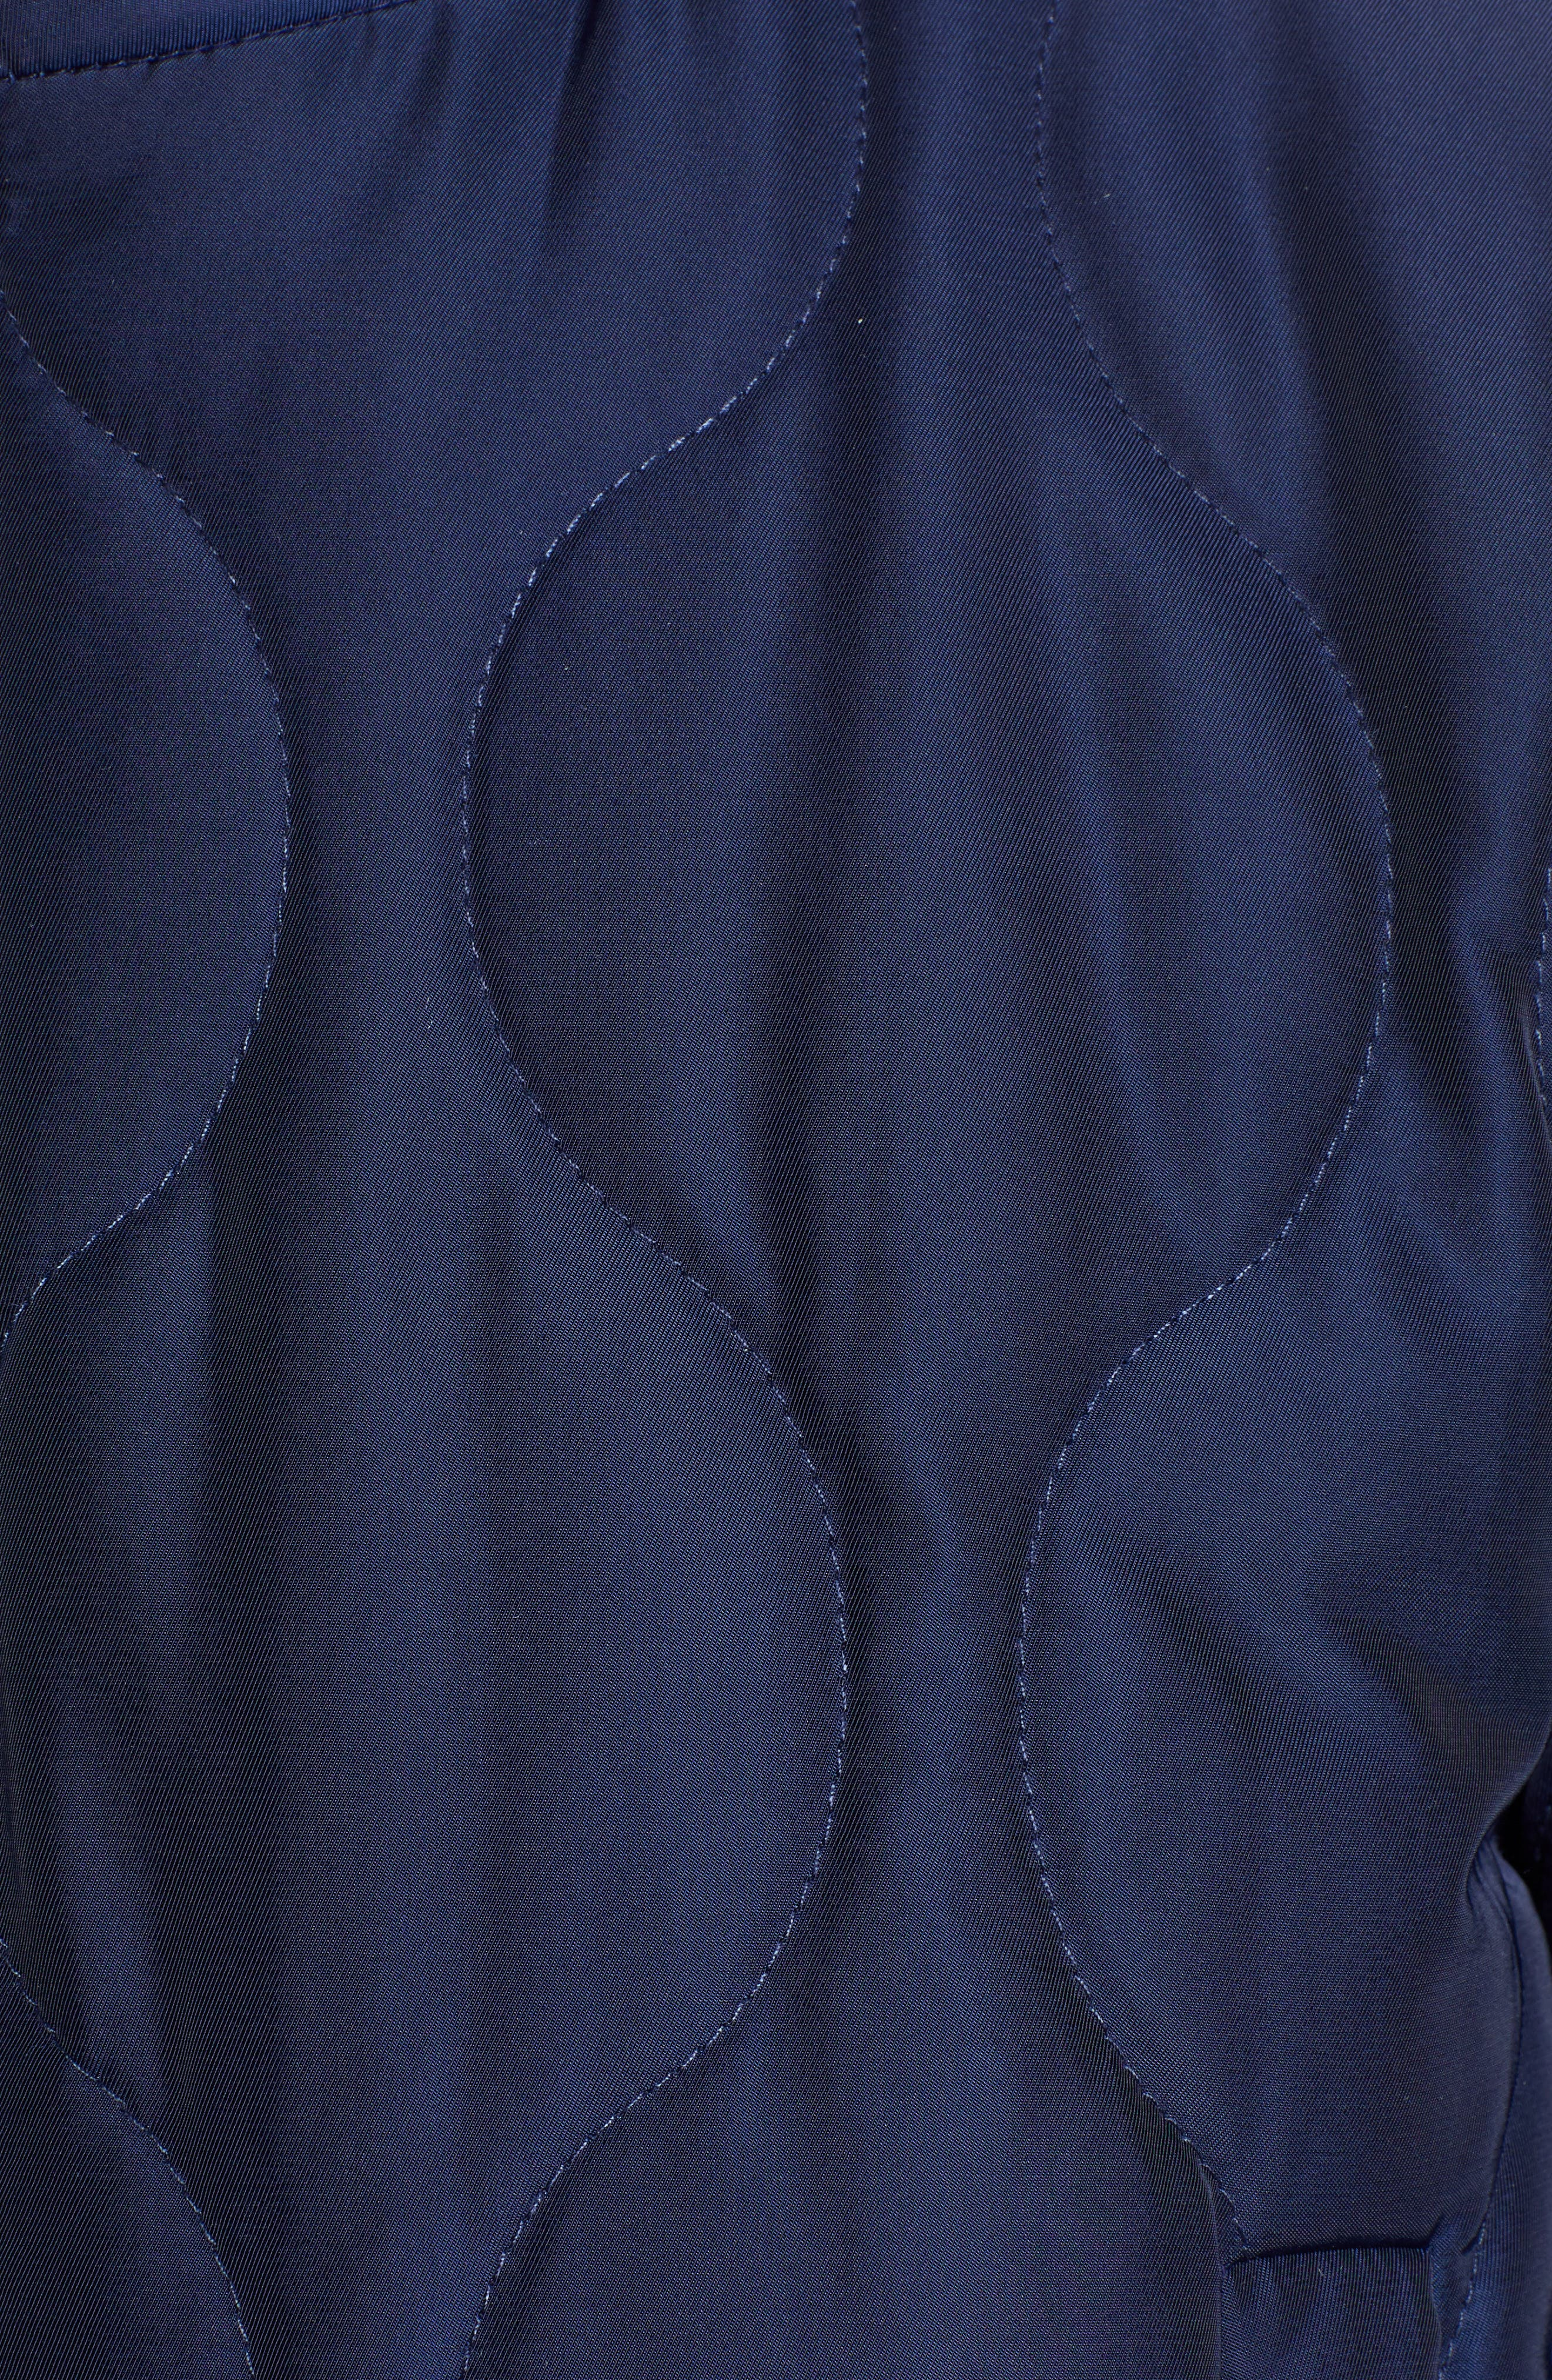 Satin Crop Puffer Jacket,                             Alternate thumbnail 7, color,                             NAVY MARITIME